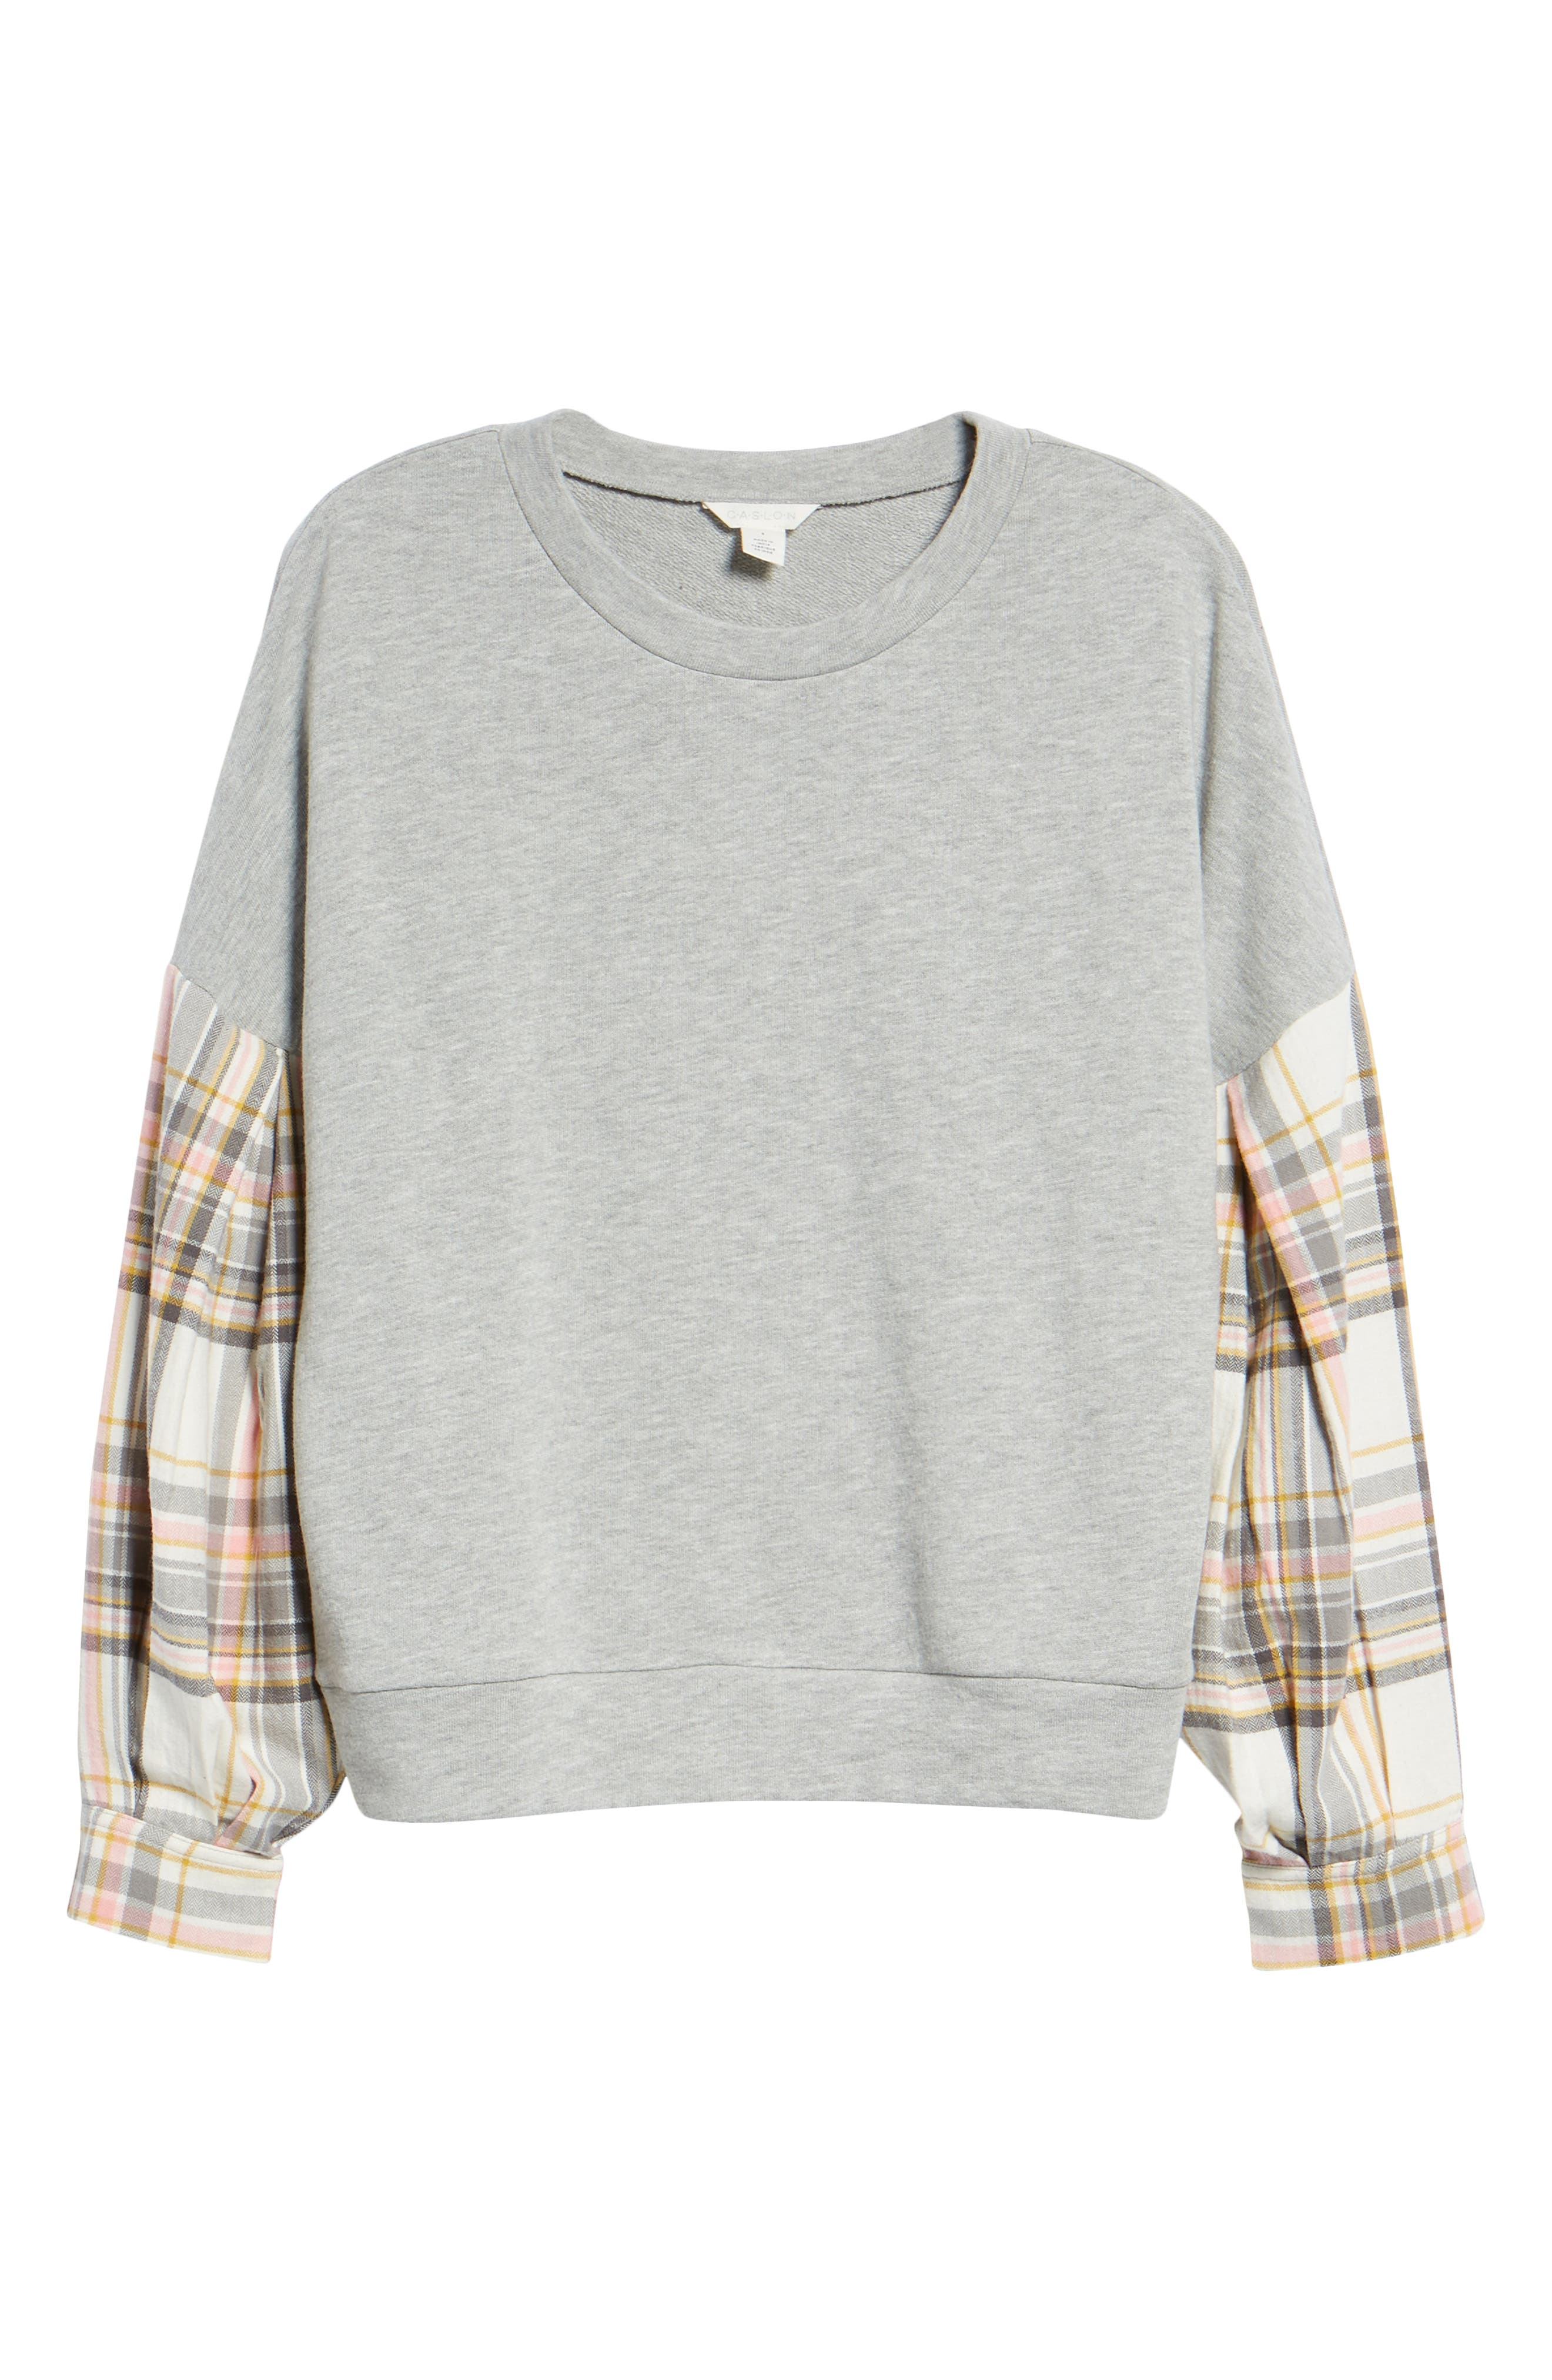 Flannel Sleeve Sweatshirt,                             Alternate thumbnail 6, color,                             030